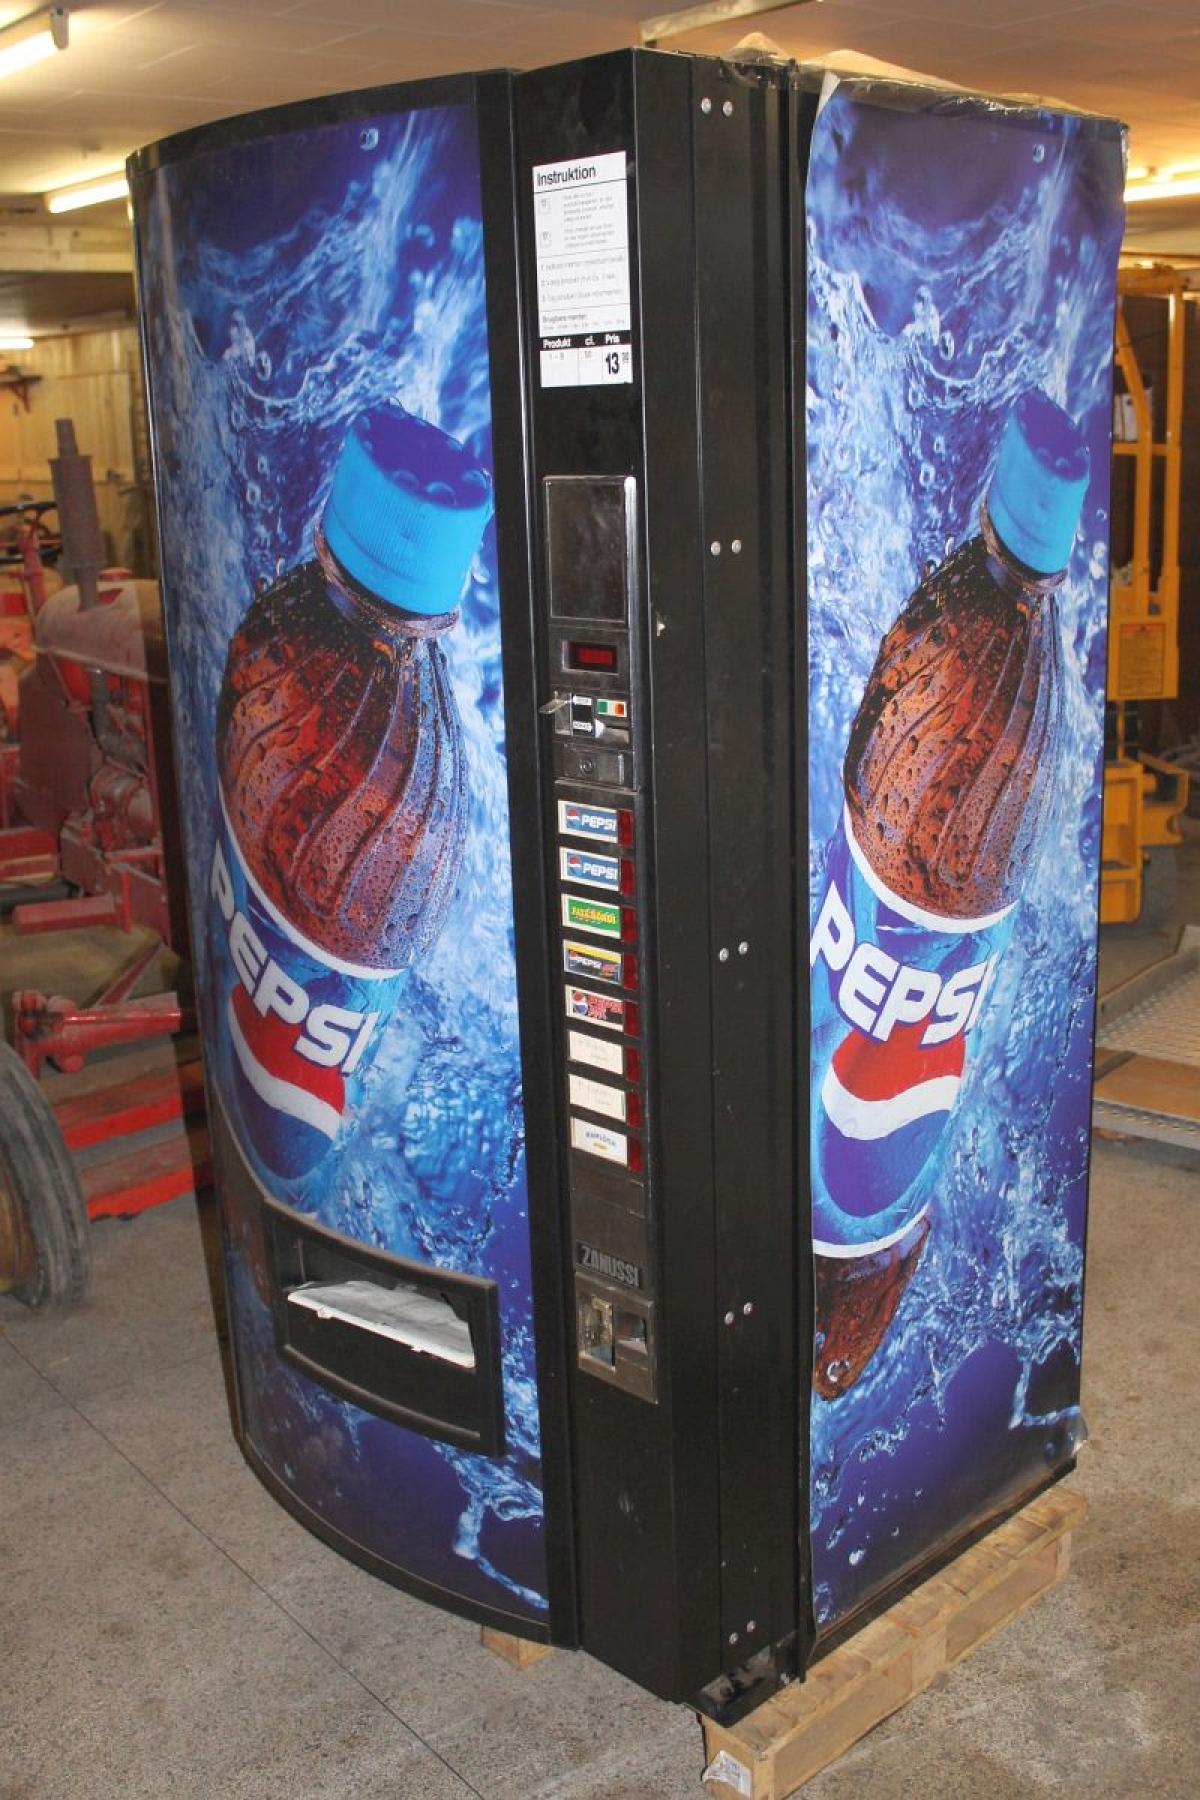 Berühmt Pepsi Kühlschrank Ideen - Die besten Einrichtungsideen ...